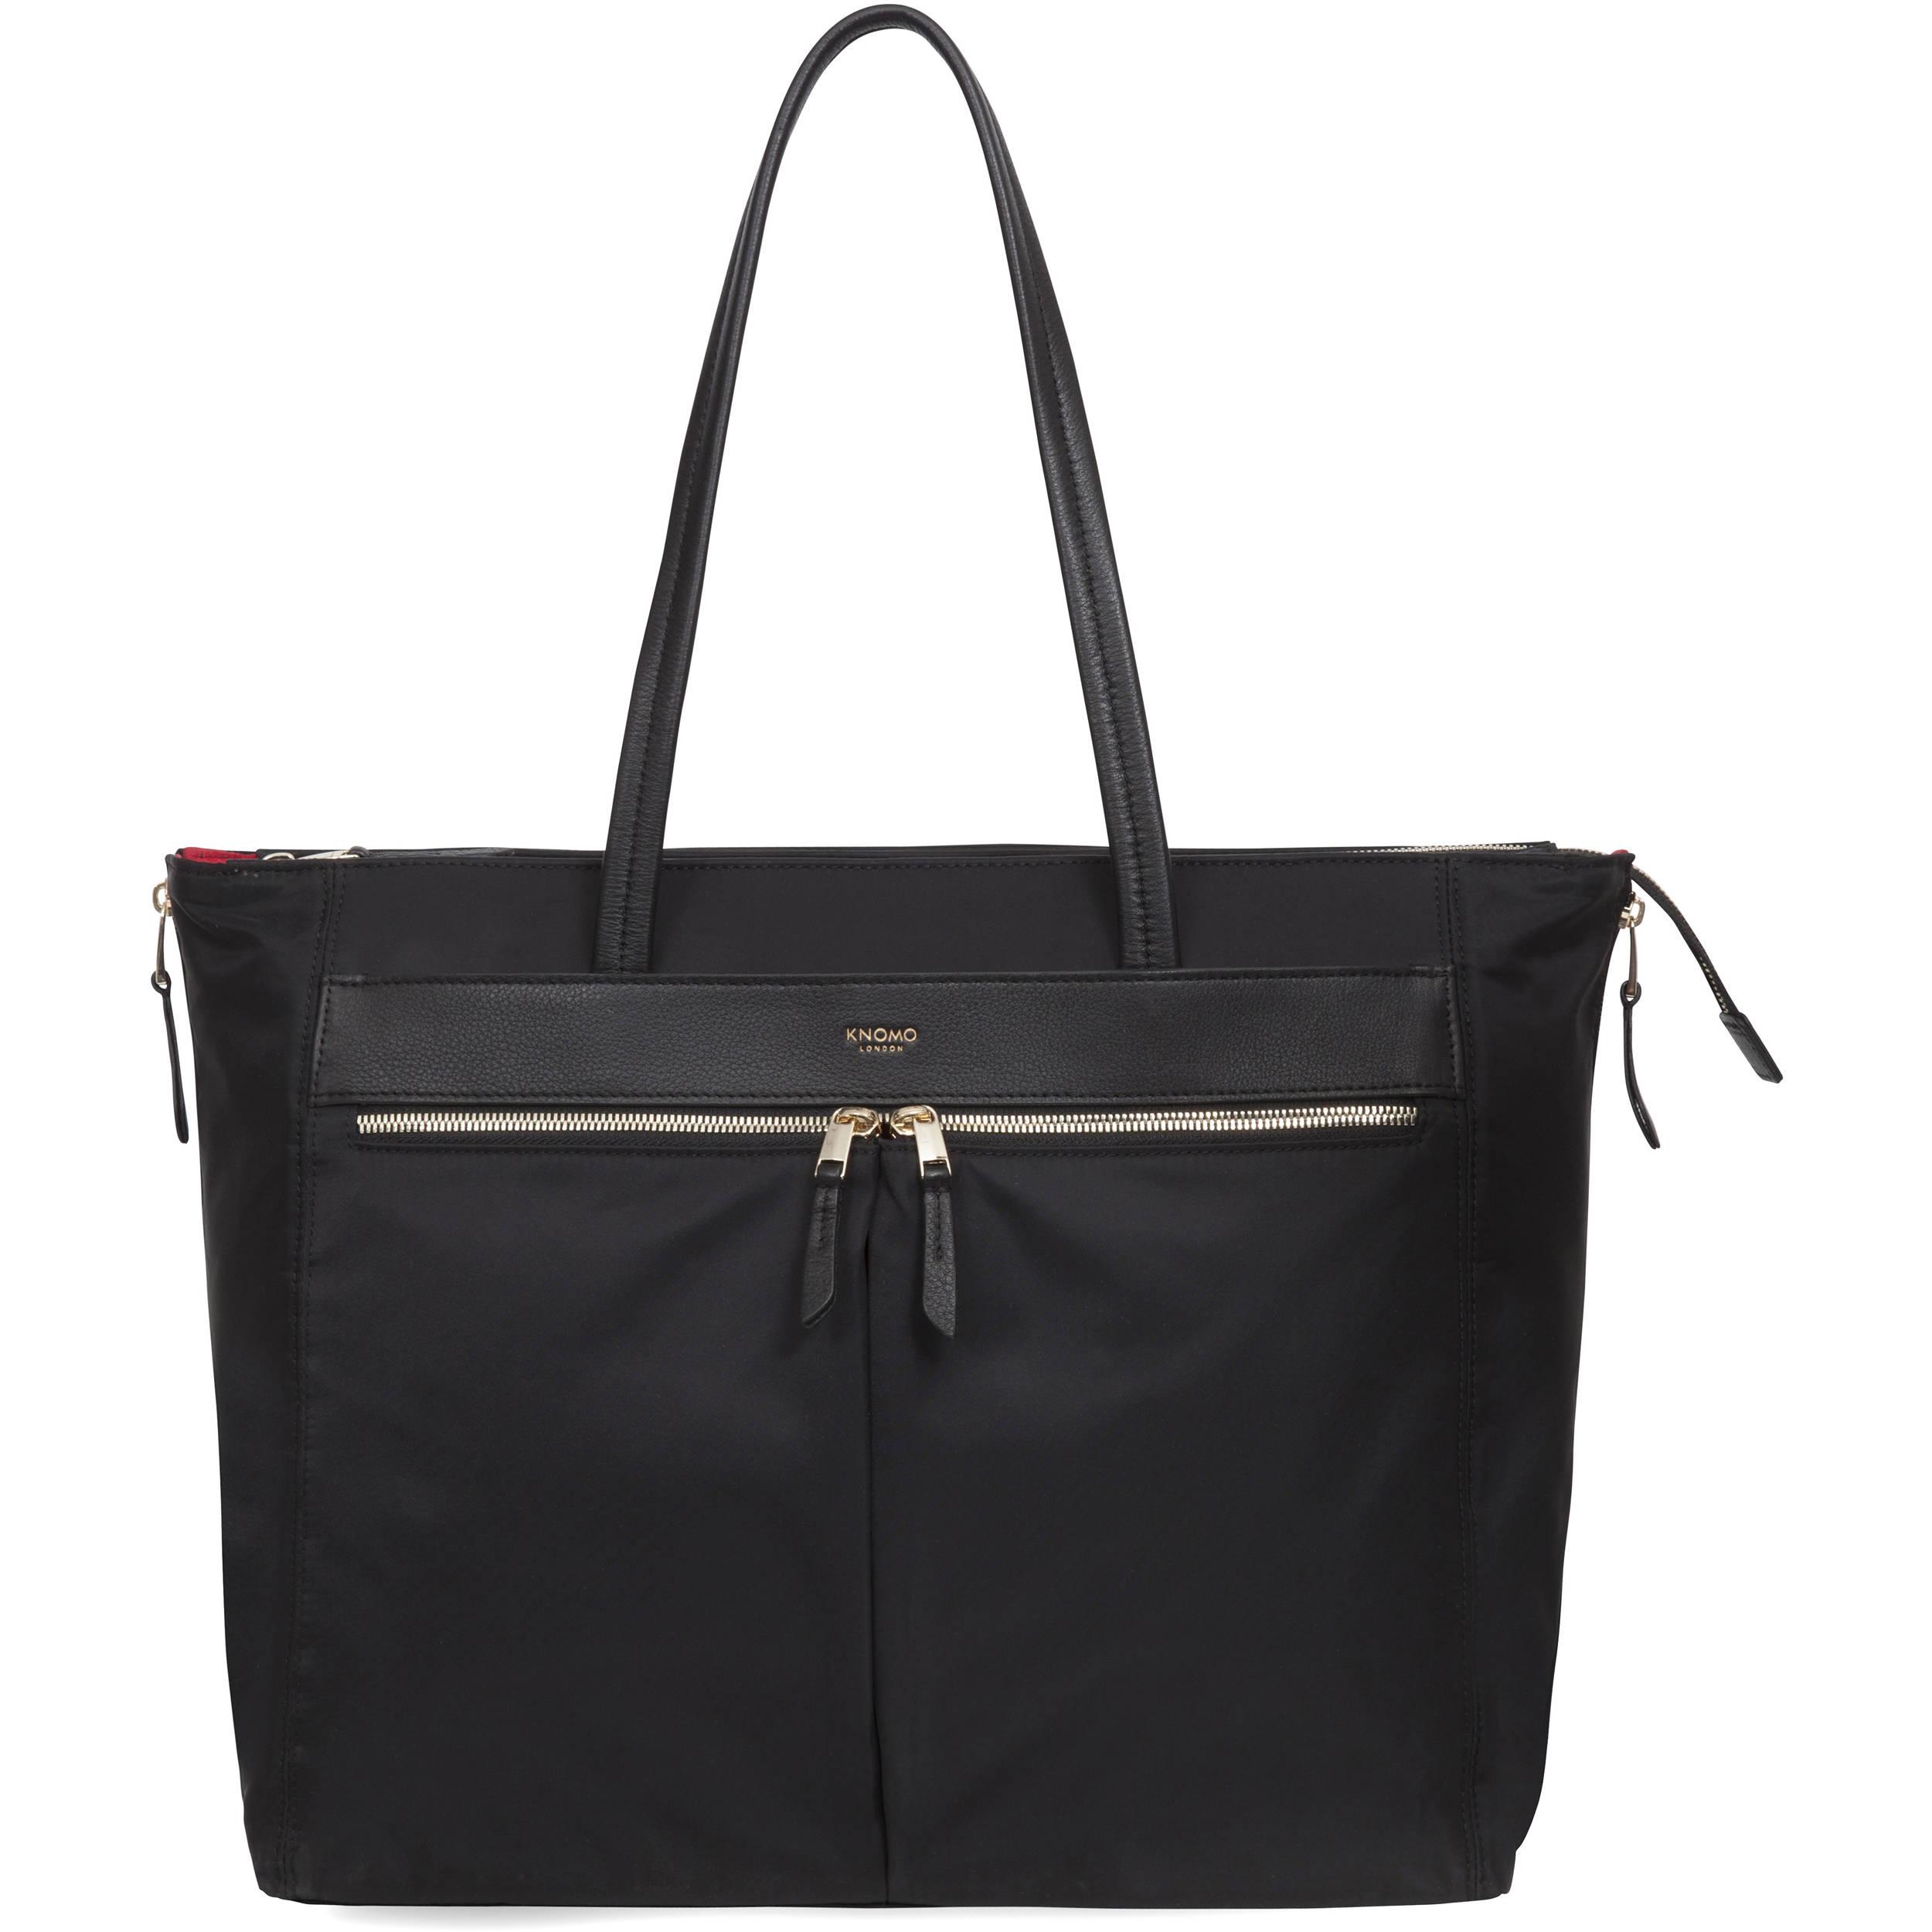 b7304bf48f0f Tote Bags Usa